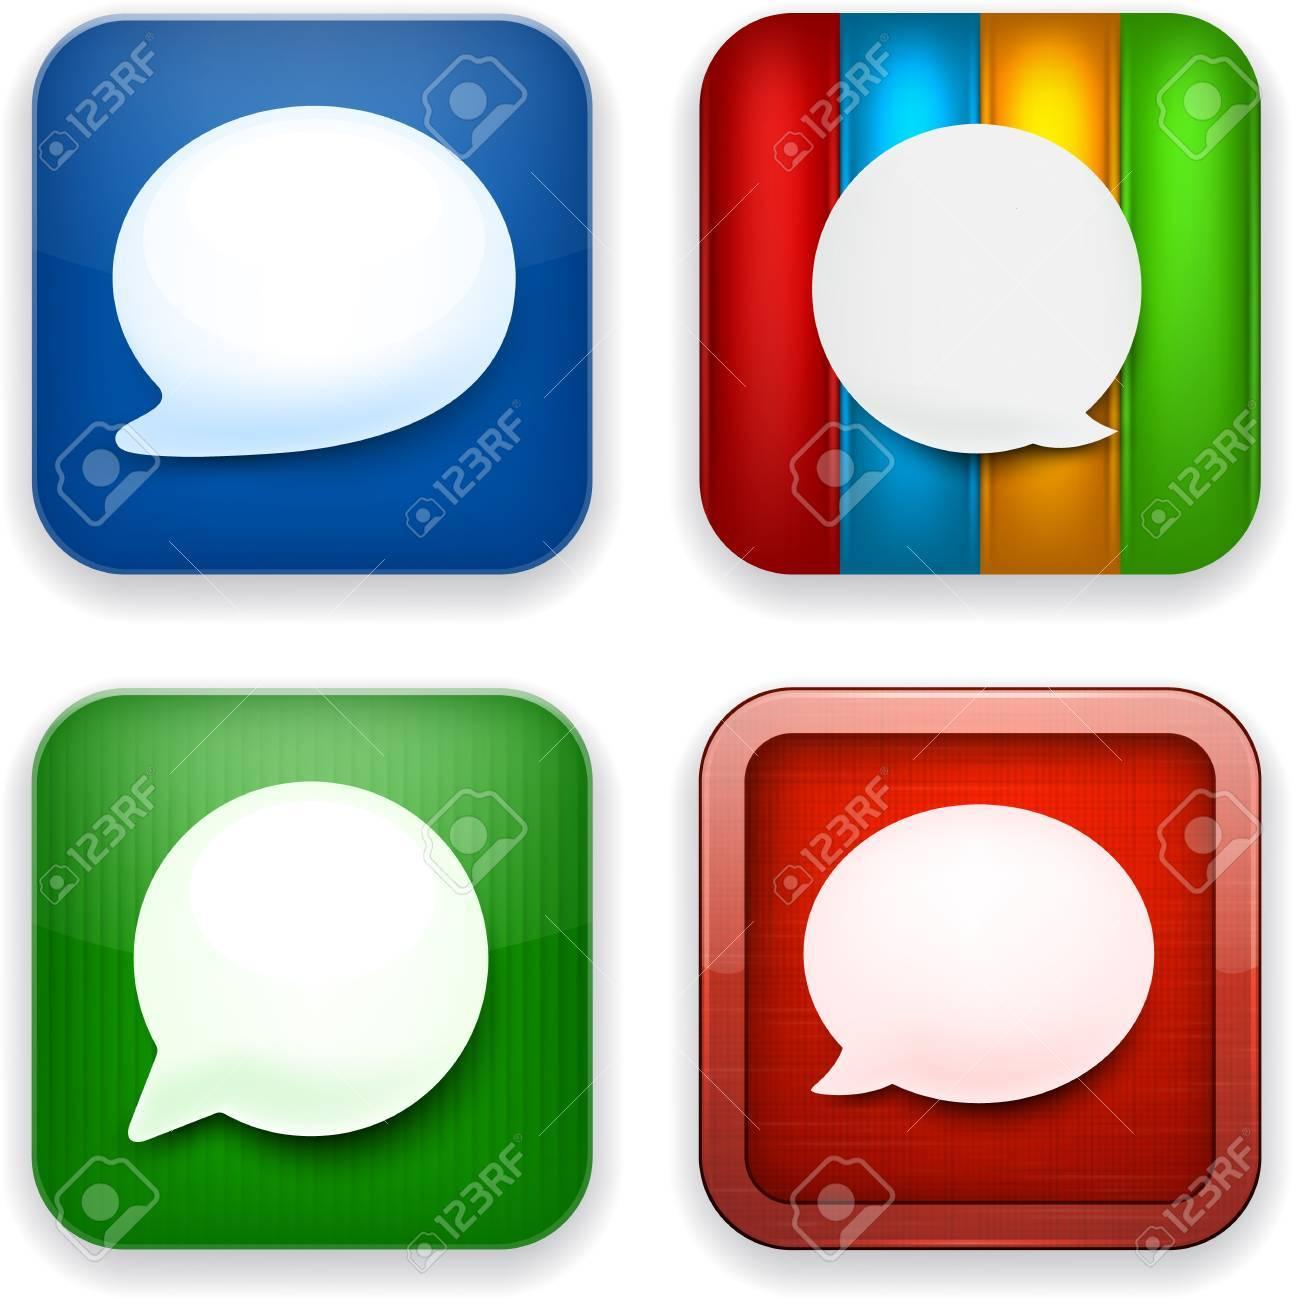 Vector illustration of high-detailed speech bubble apps icon templates. Talk concept. Stock Vector - 17872609